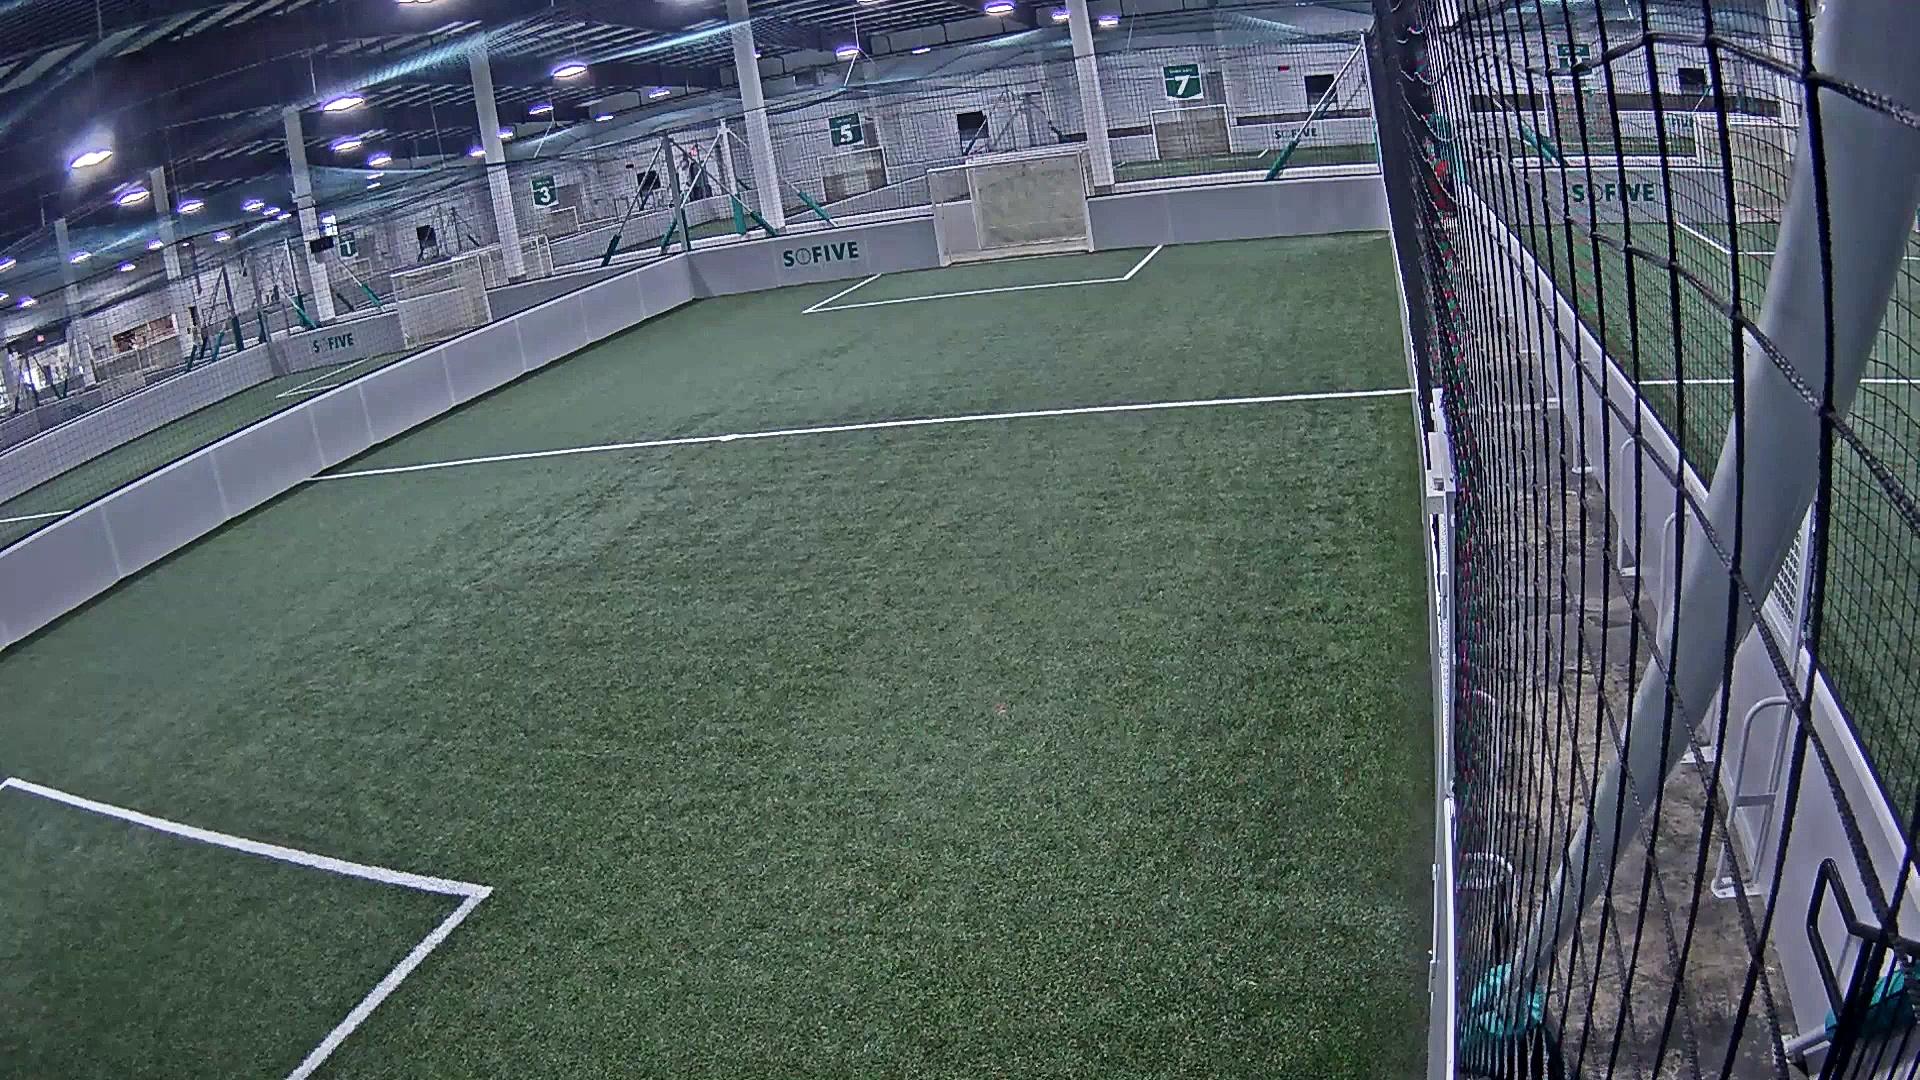 09/15/2019 13:00:01 - Sofive Soccer Centers Brooklyn - Monumental